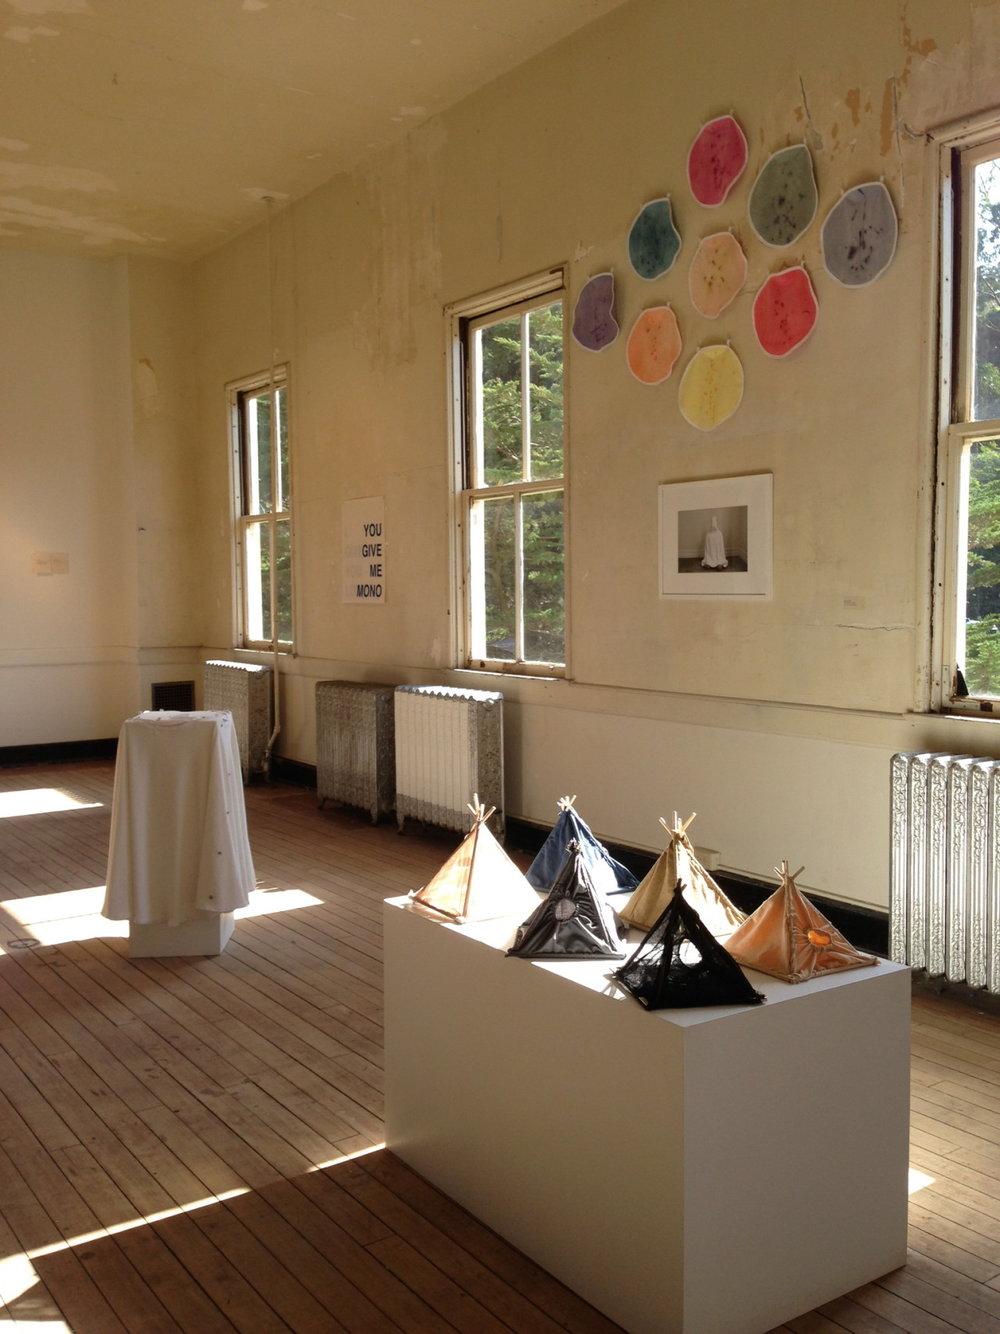 Rags, Portables, Cloak (installation view Headlands).jpg